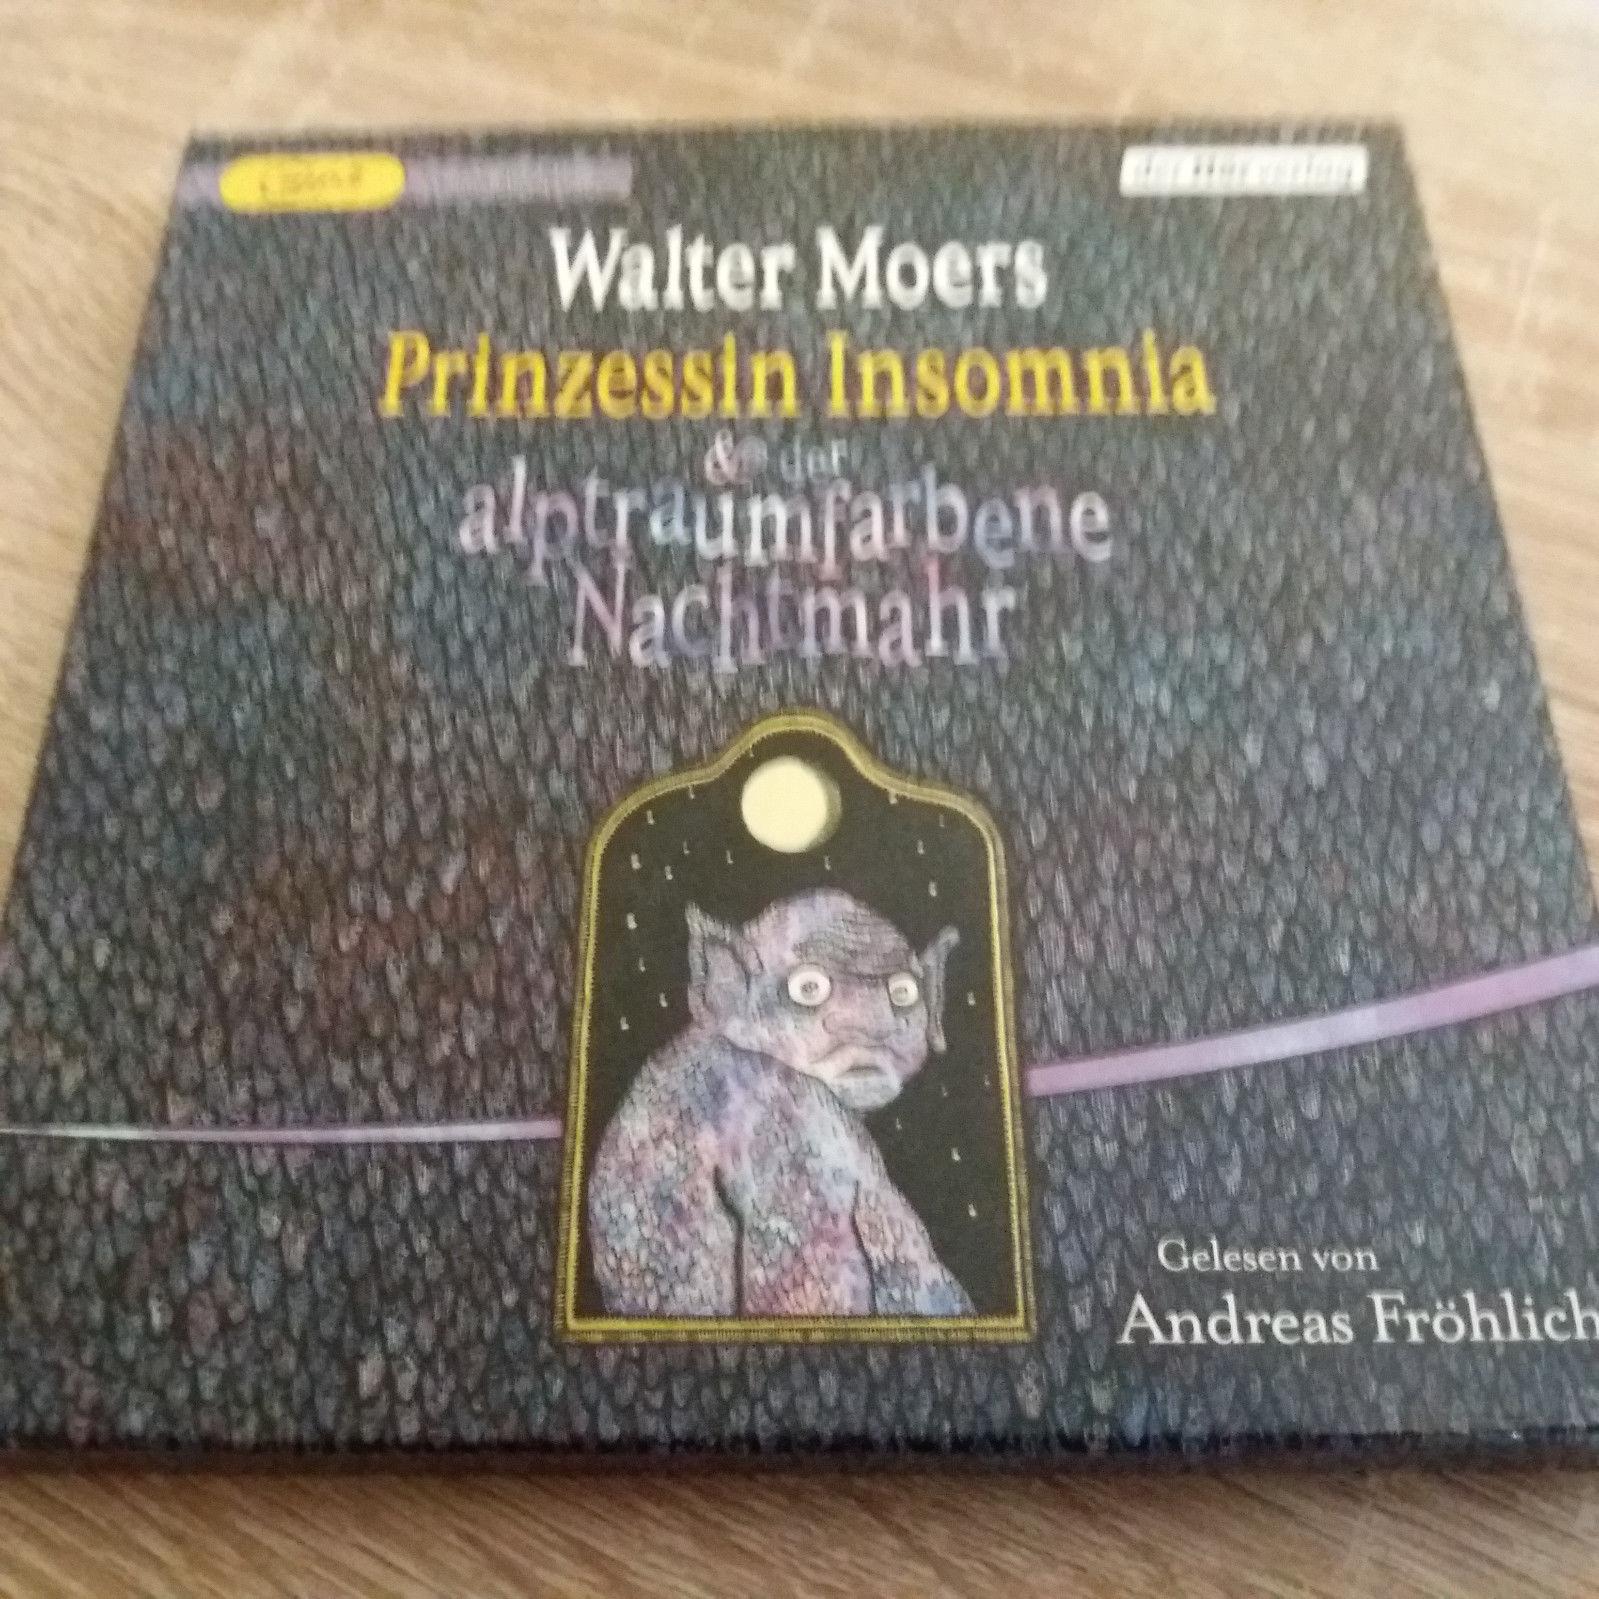 Hörbuch Walter Moers - Prinzessin Insomnia & der alptraumhafte Nachtmahr MP3-Cd